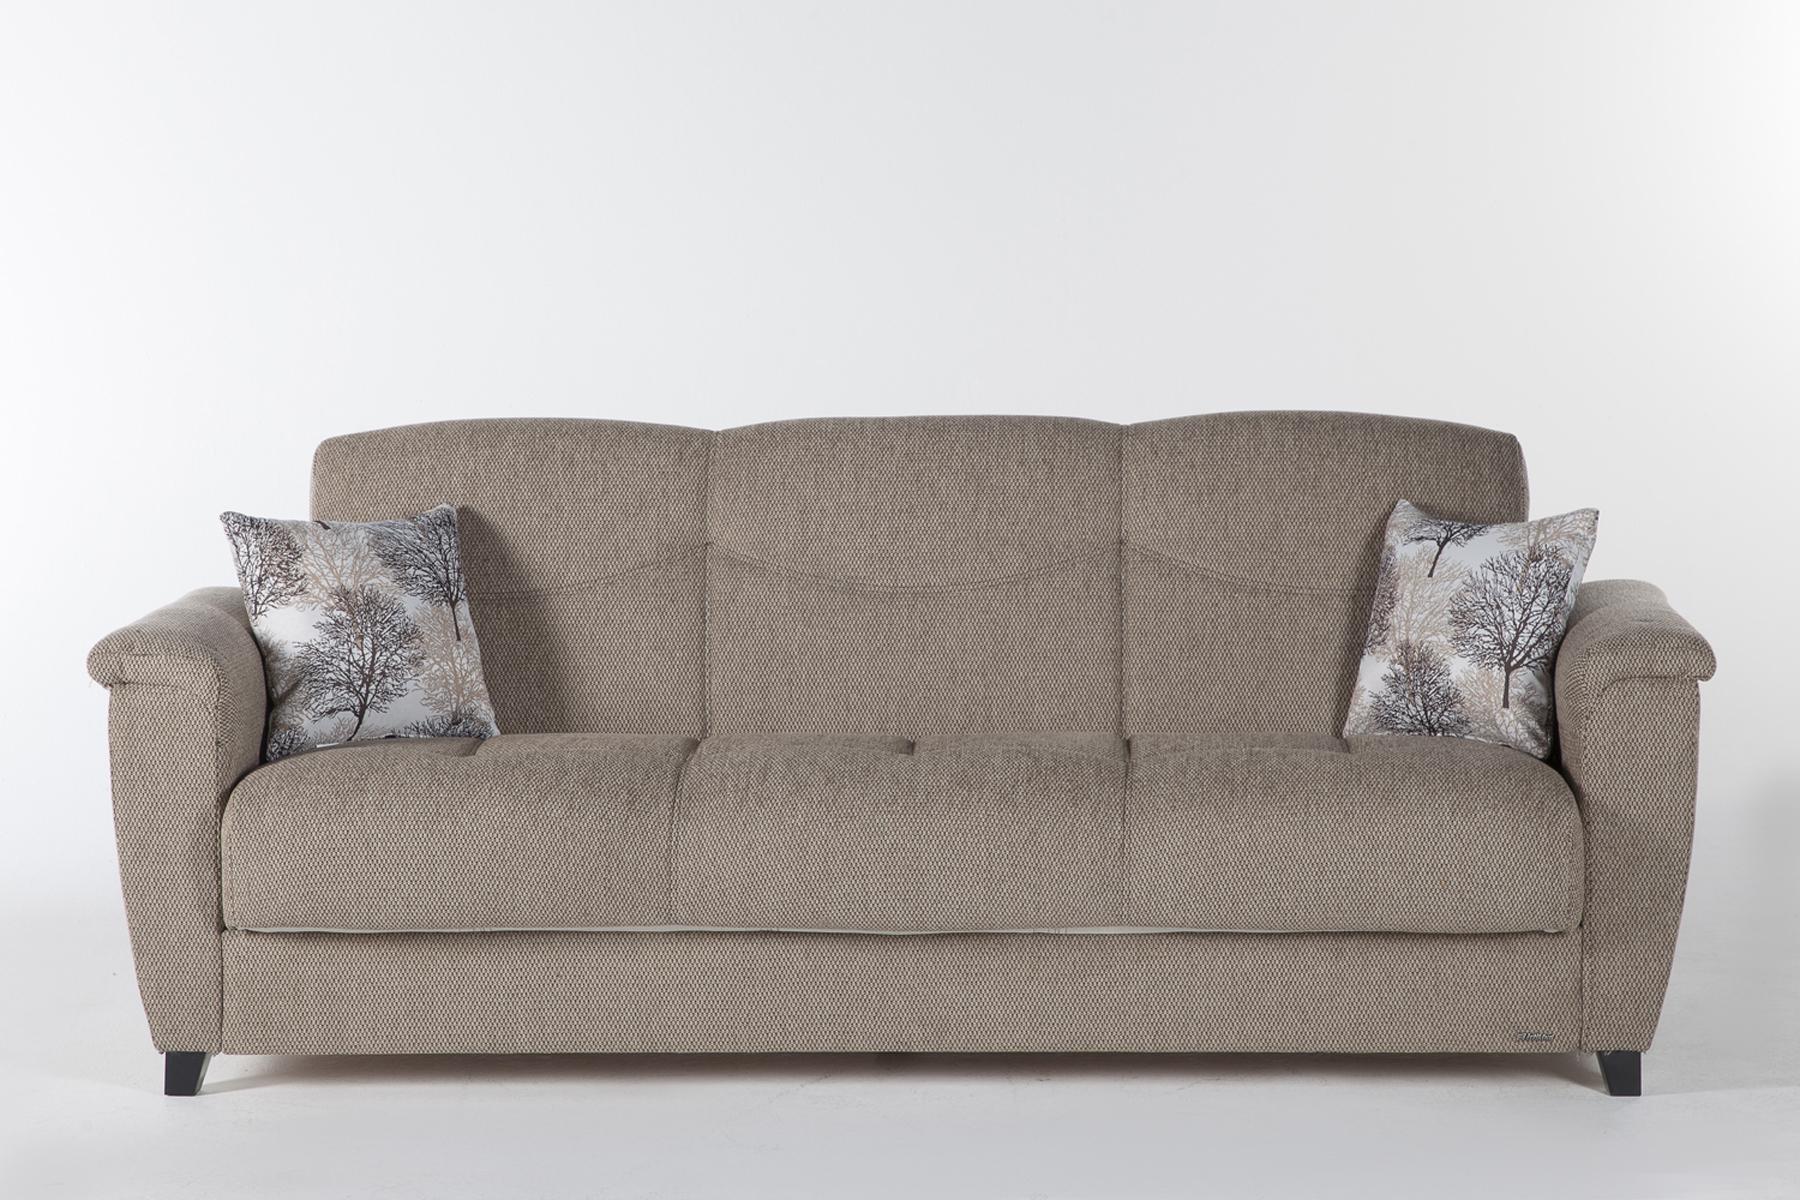 Aspen Sofa Sleeper – Forest Brown (Copy)